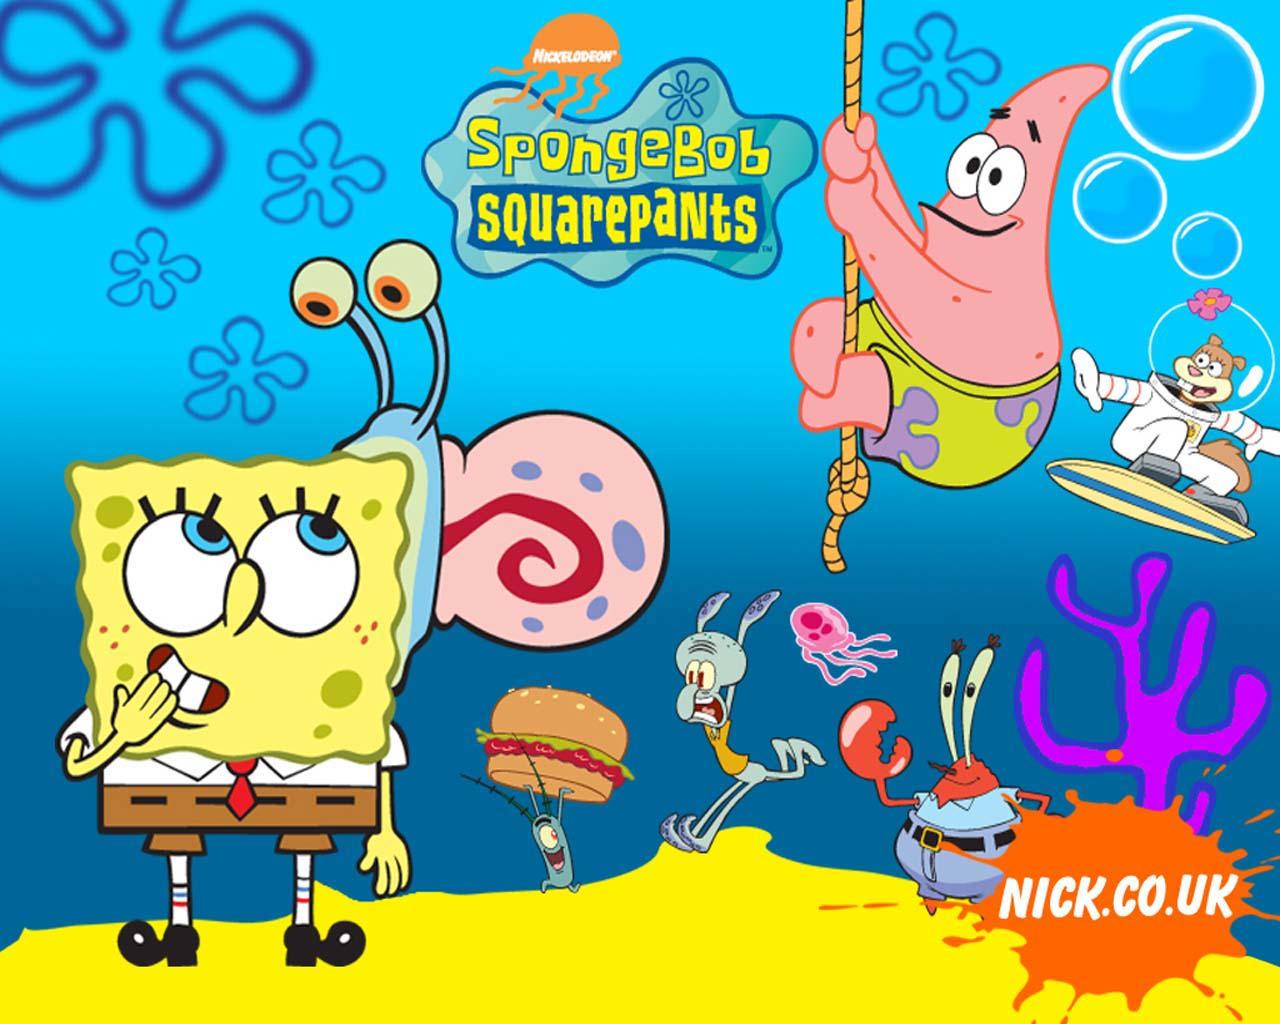 spongebob spongebob spongebob squarepants